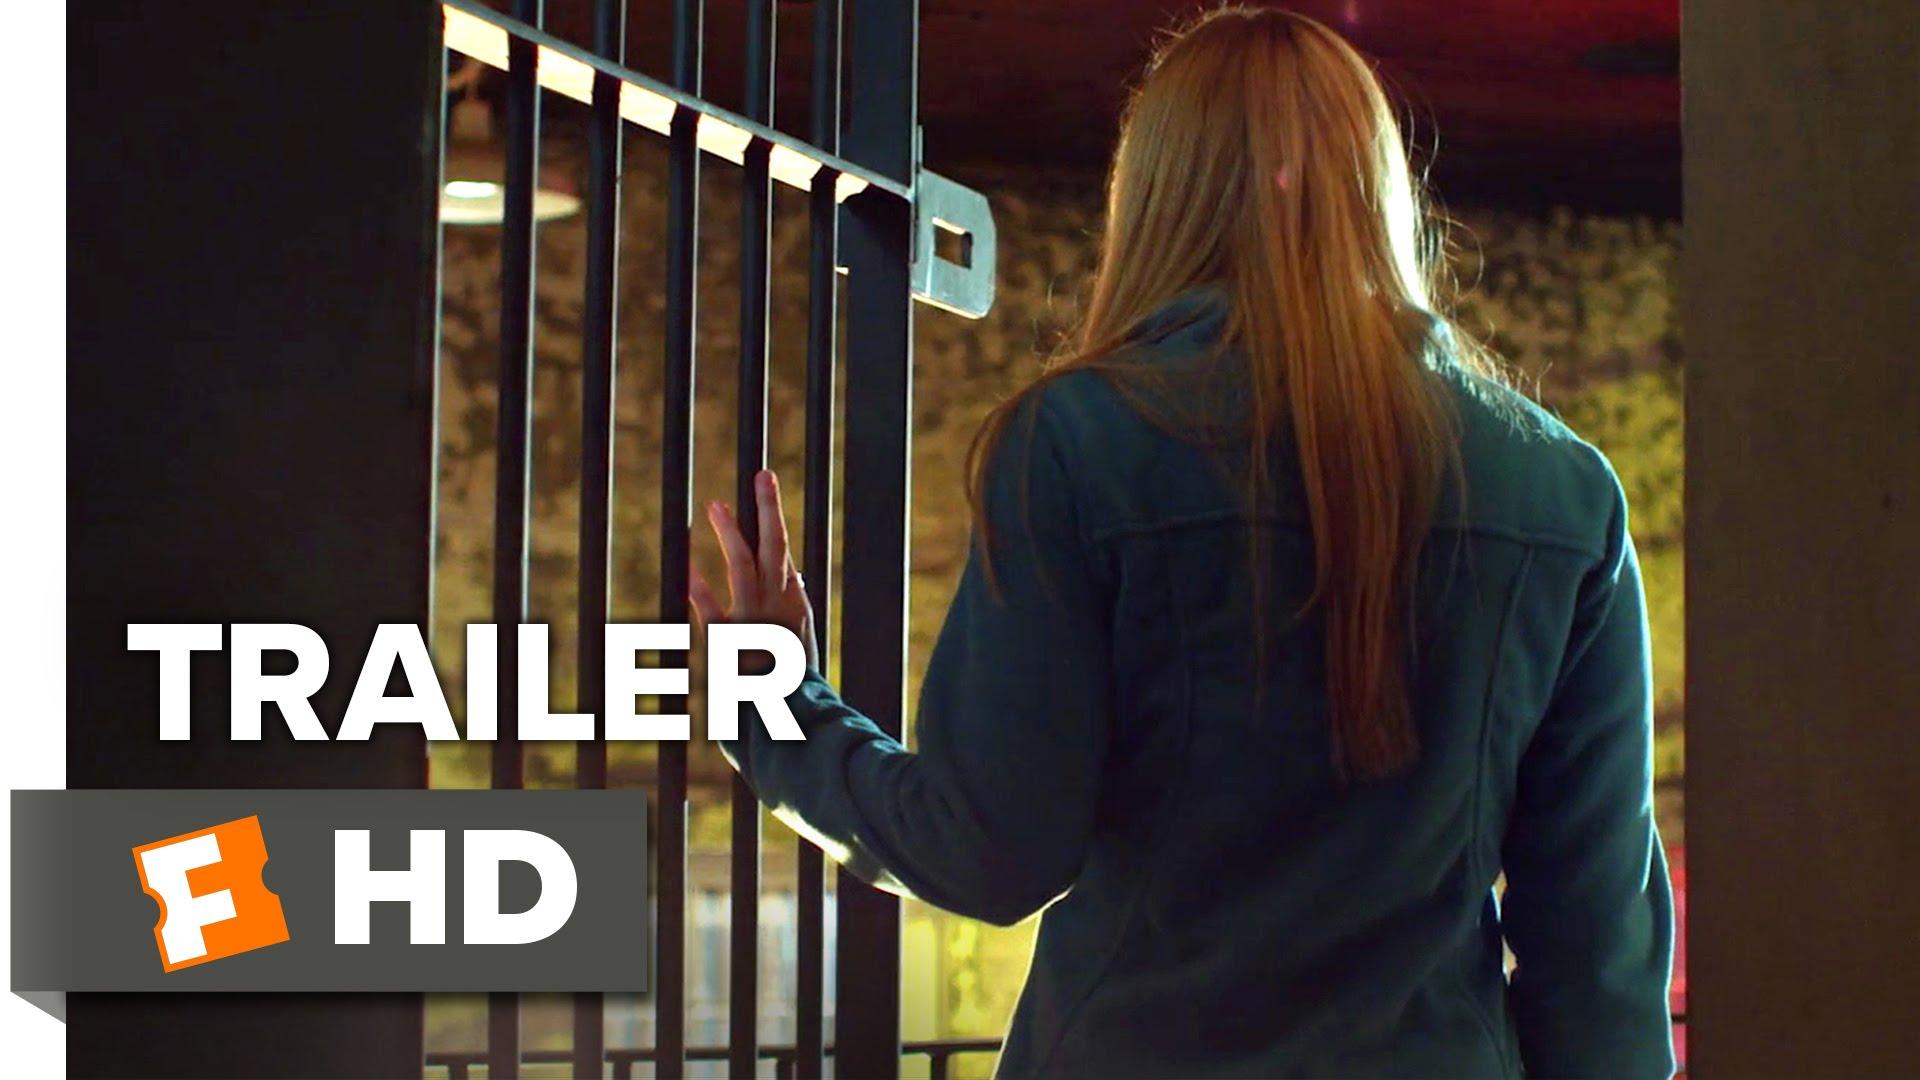 Big Bad Official Trailer 1 (2016) - Horror Movie